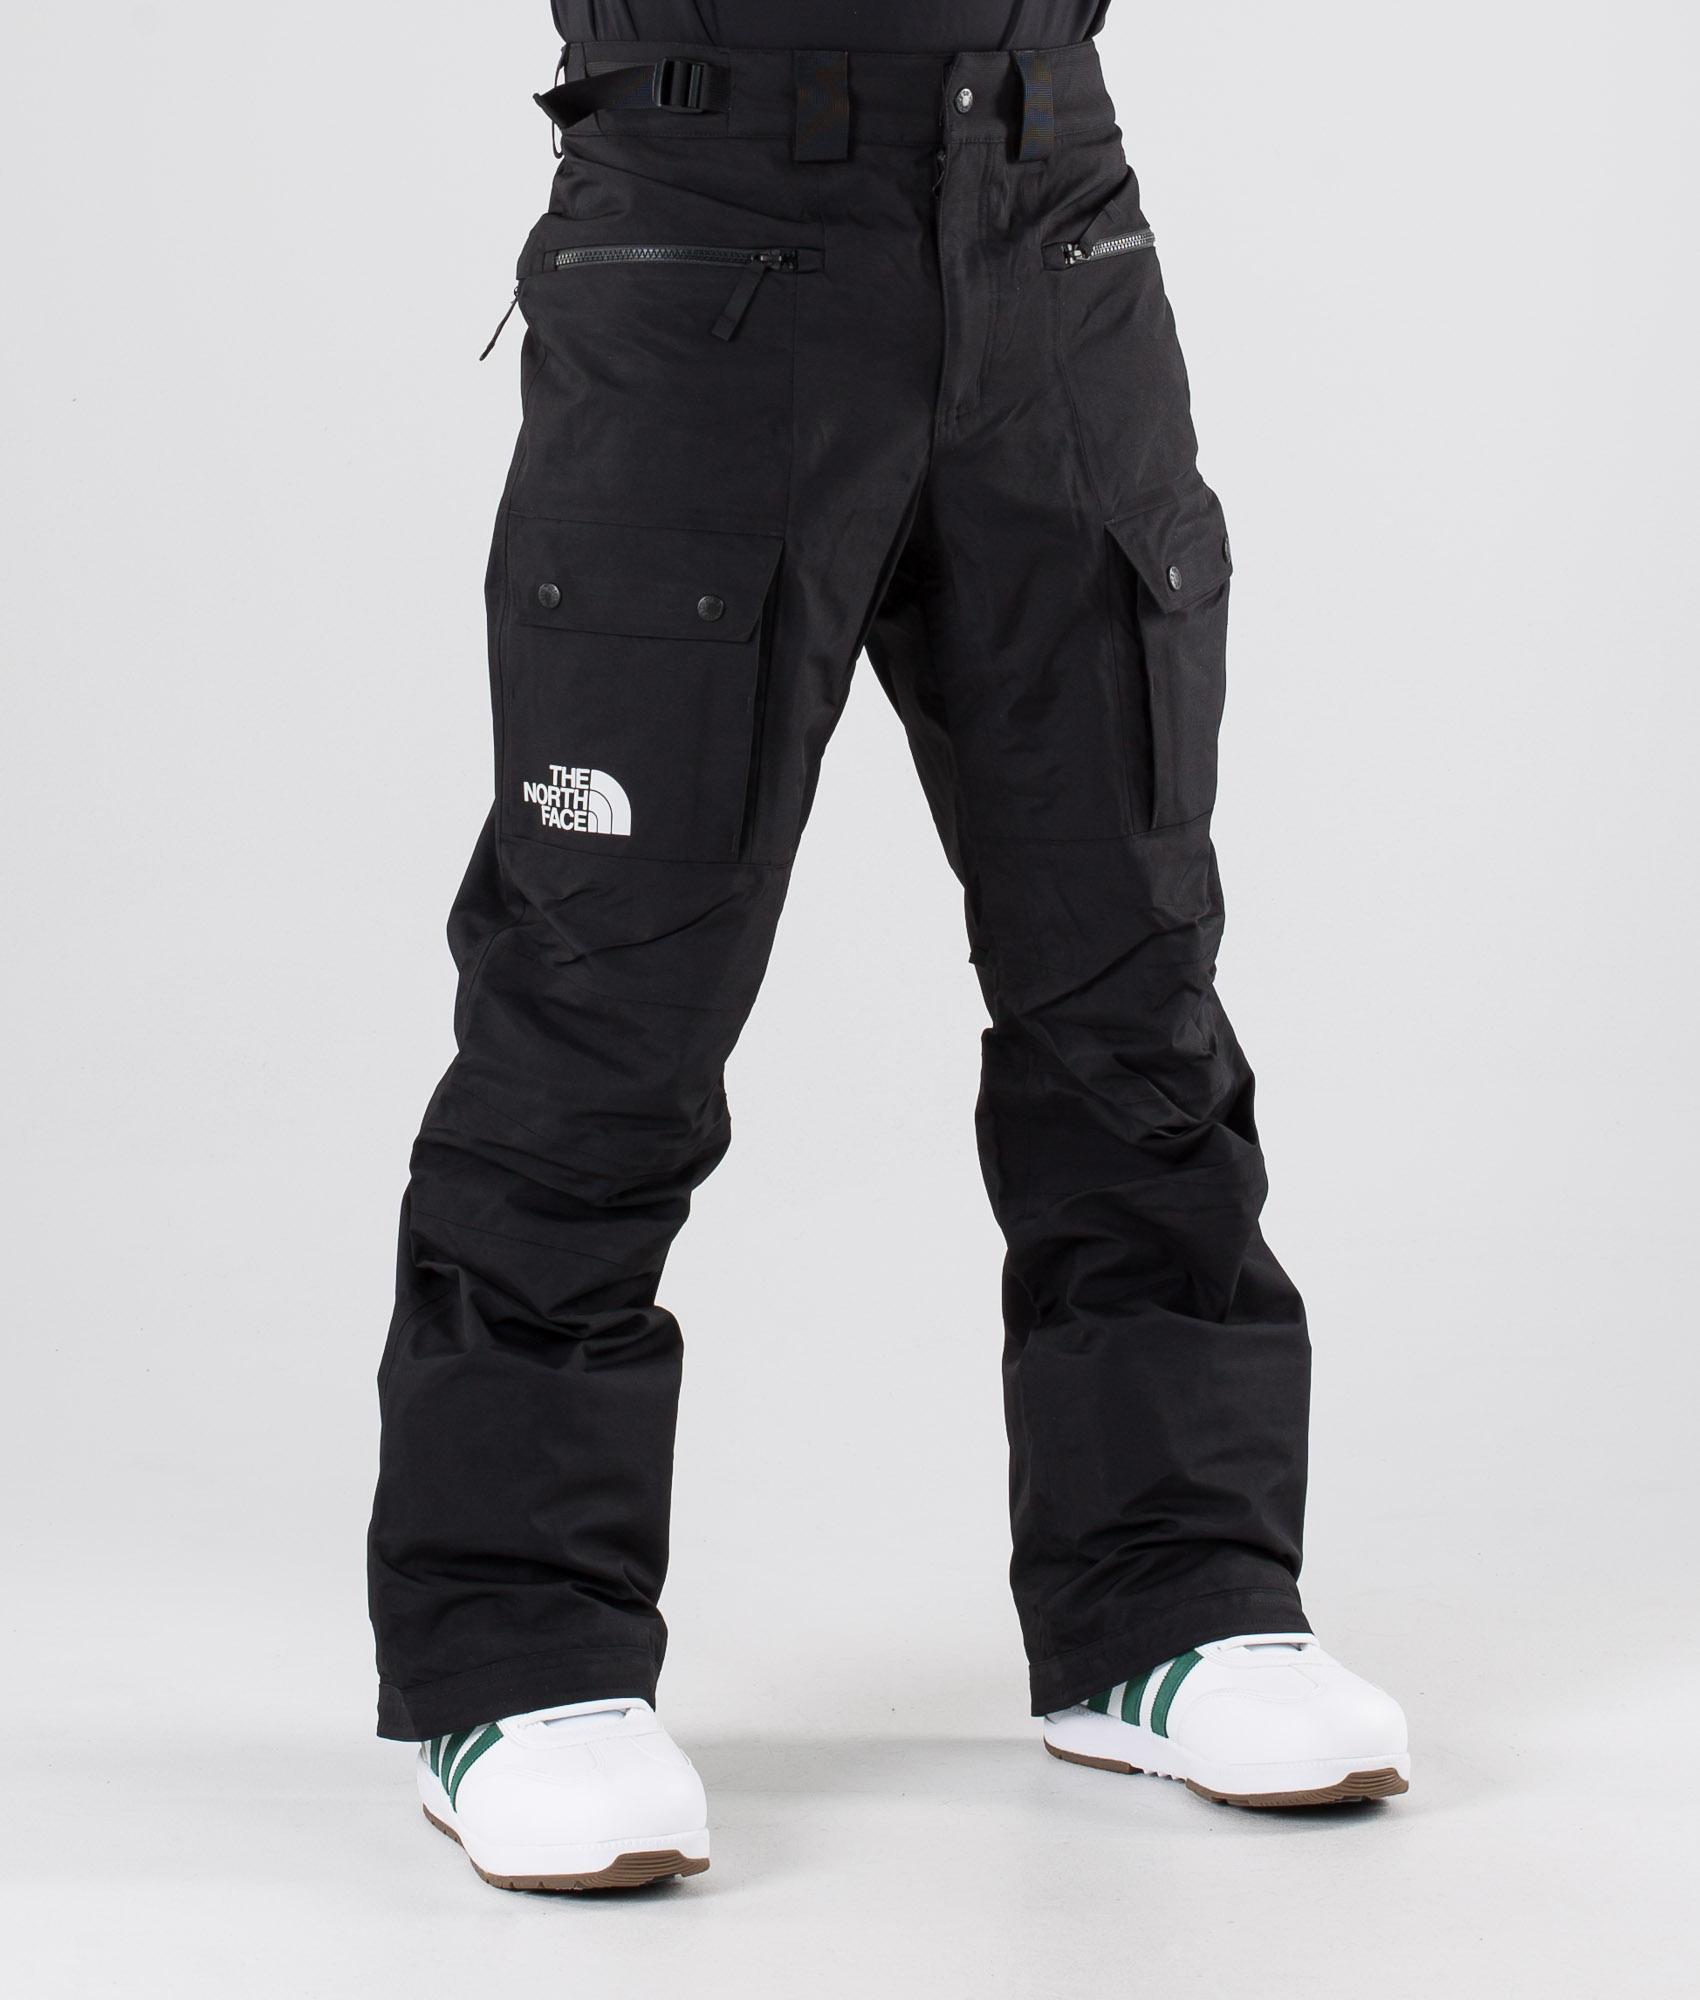 The North Face SLASHBACK Ski & snowboardbukser black